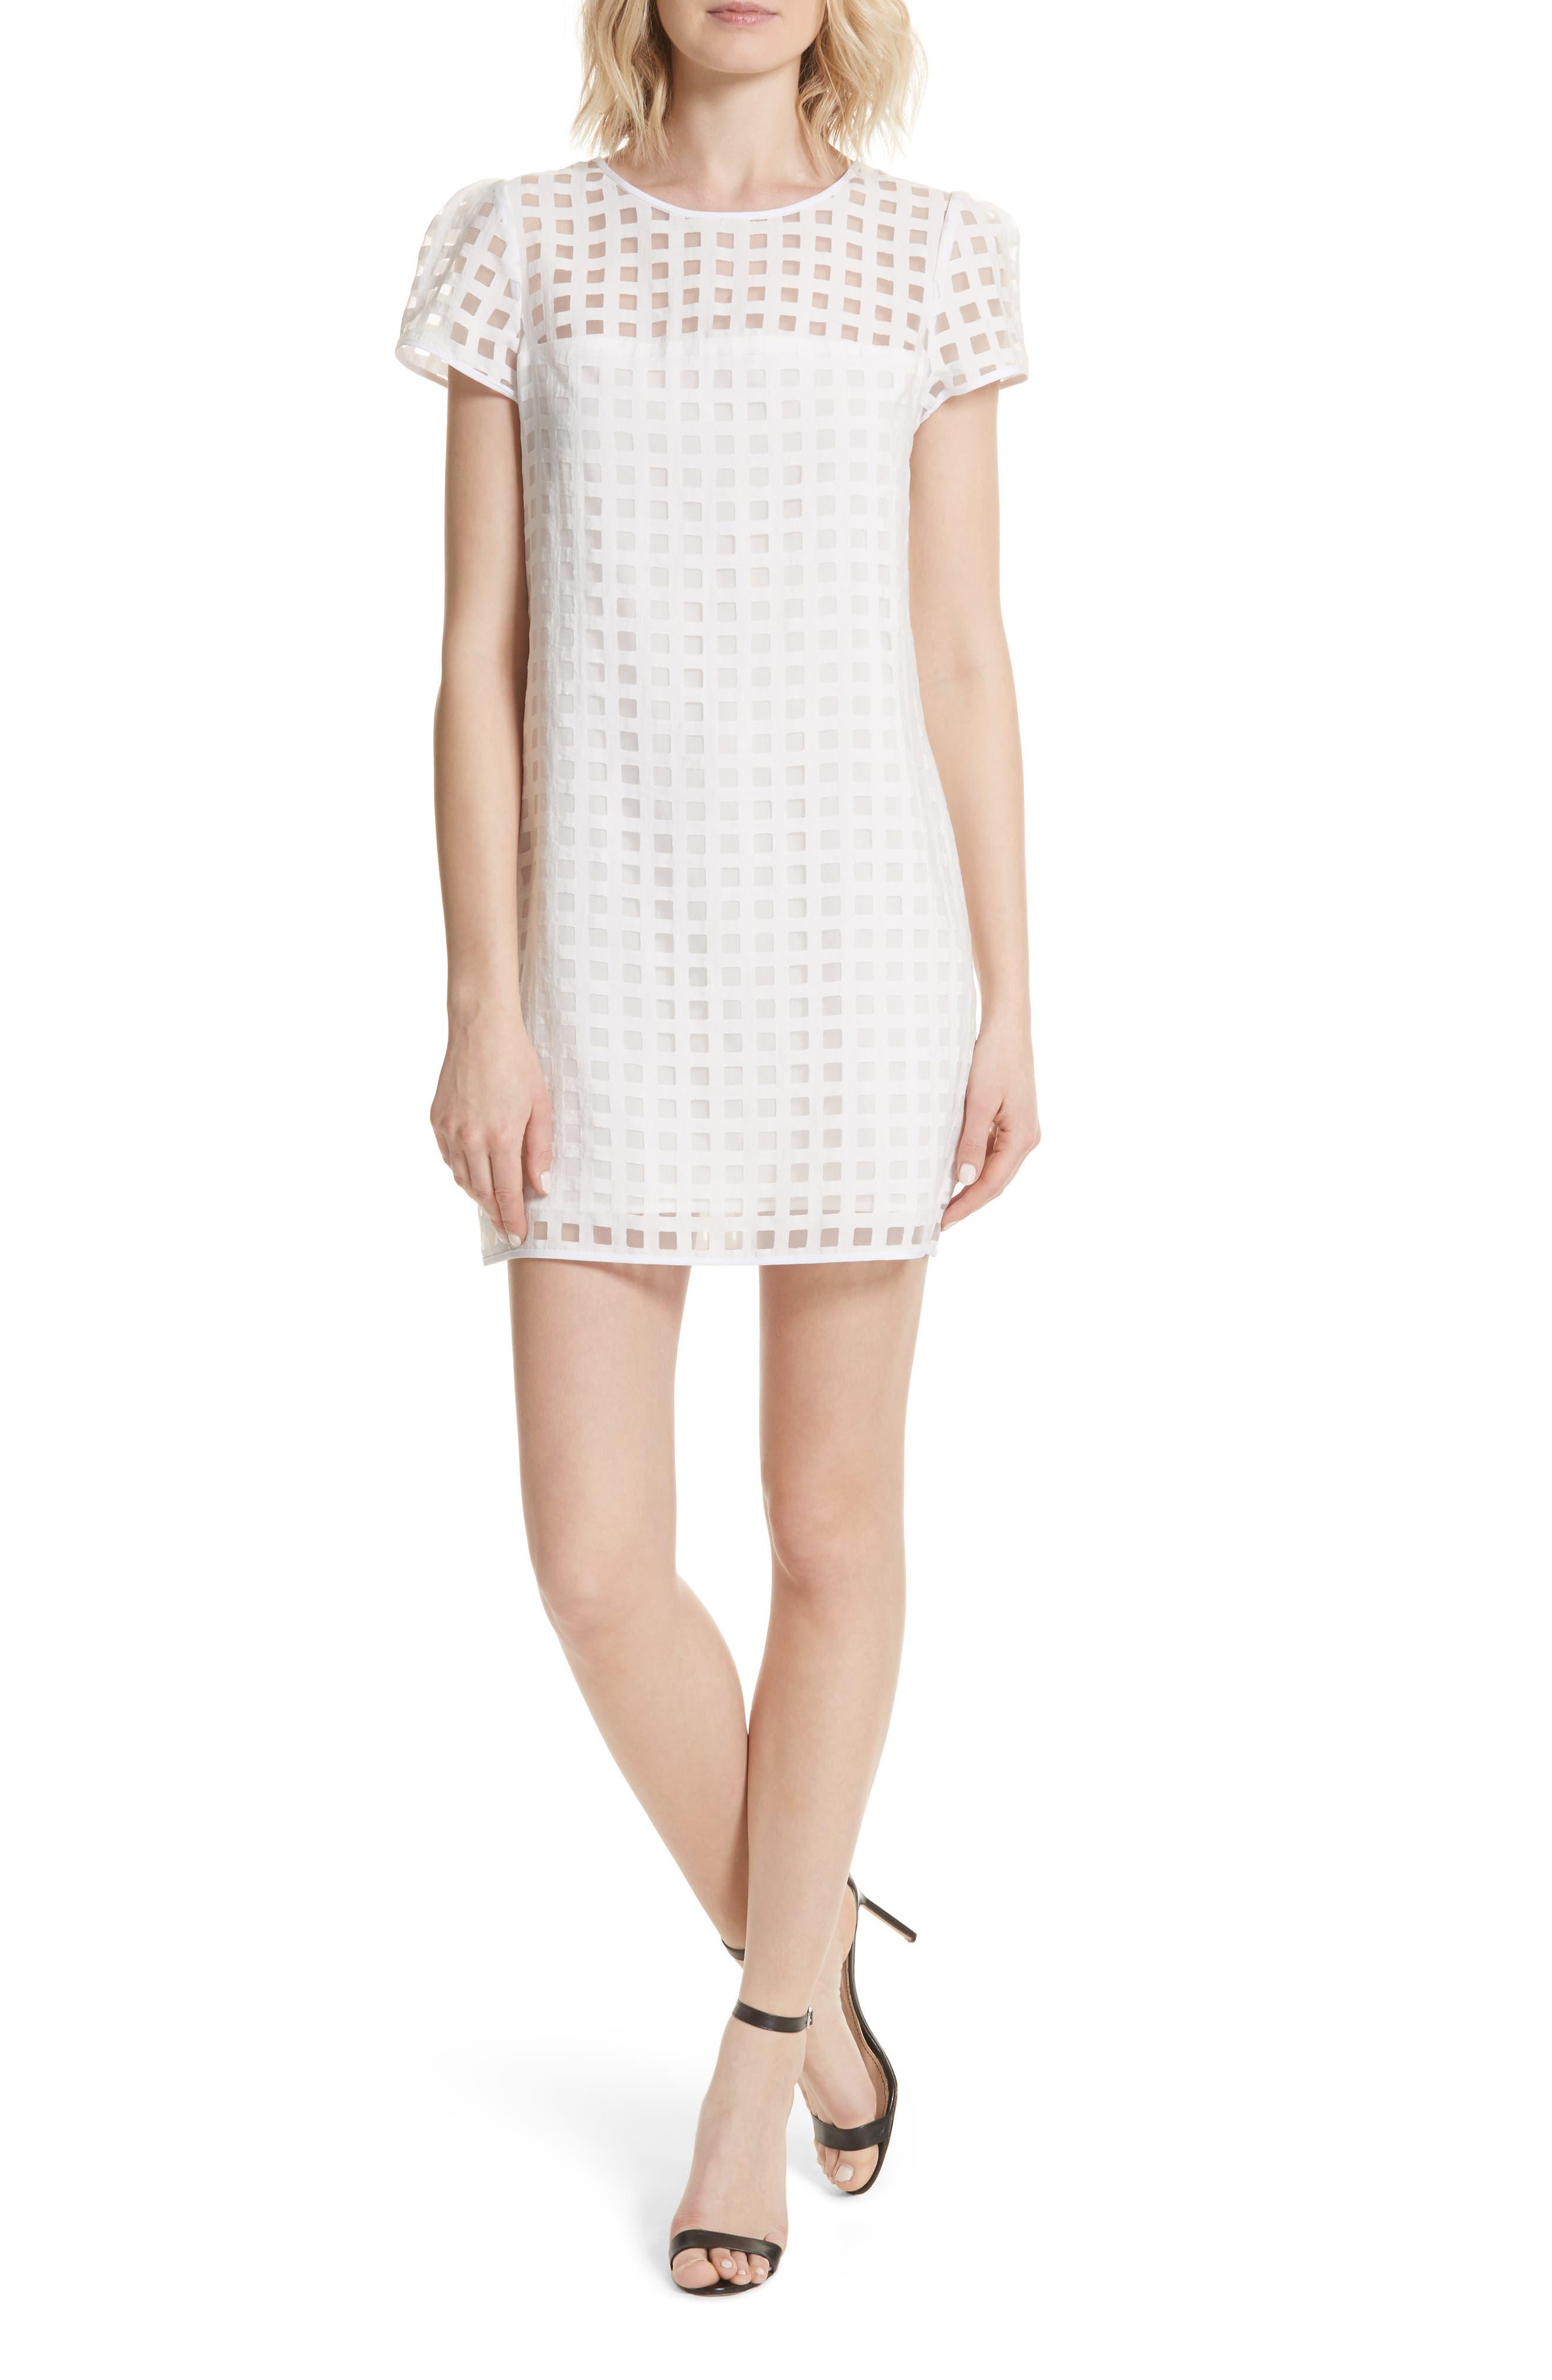 MILLY Chloe Illusion Check Shift Dress, Main, color, 150